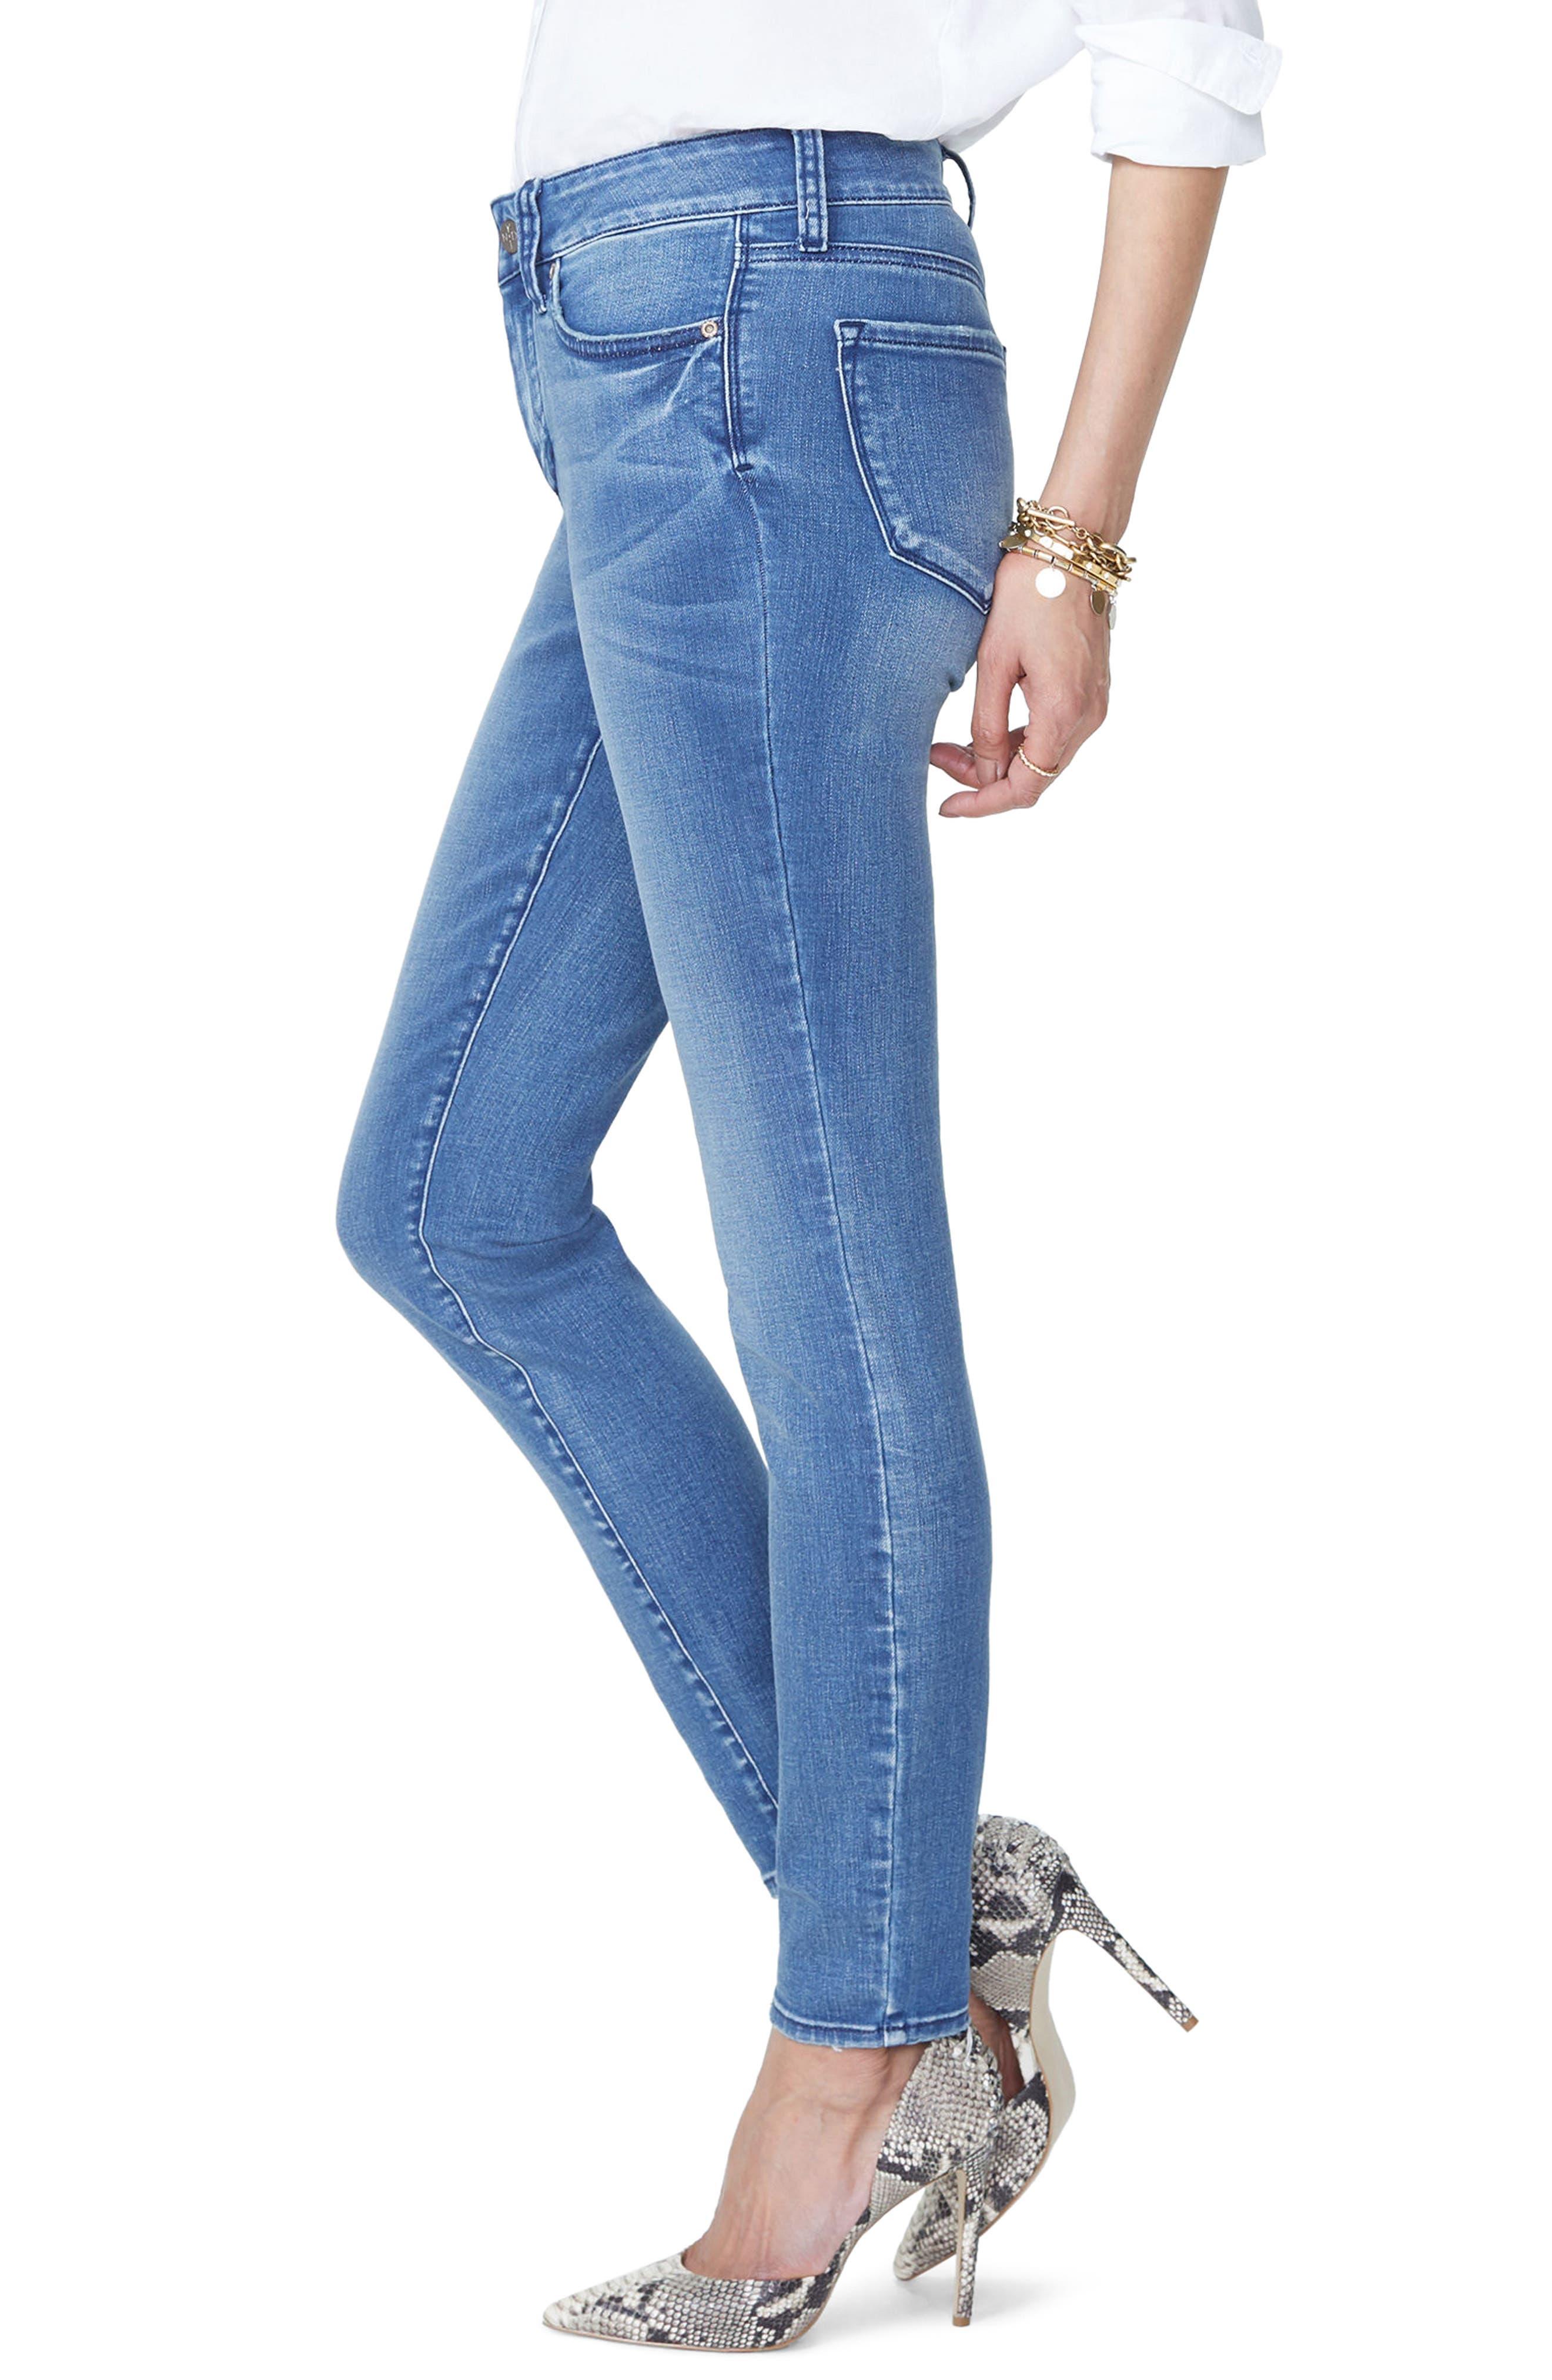 Ami High Waist Stretch Skinny Jeans,                             Alternate thumbnail 3, color,                             WISHFUL